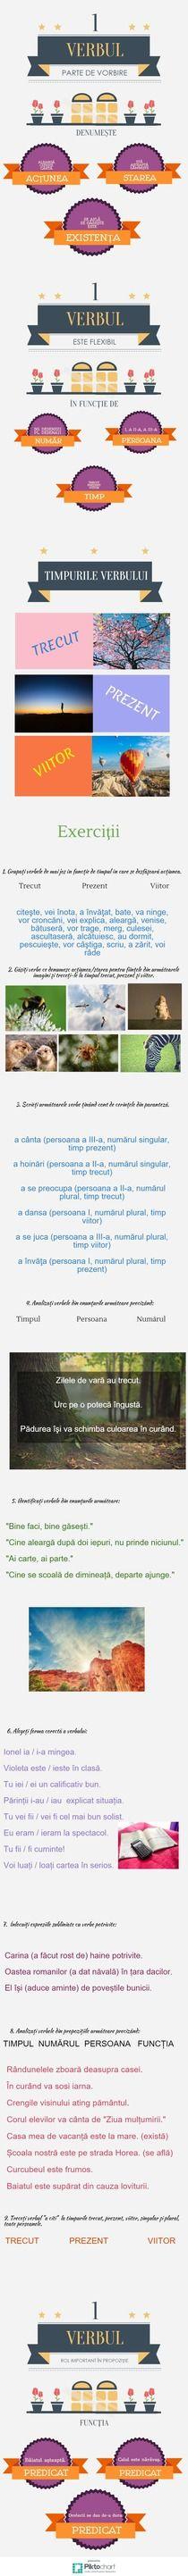 verbul | Piktochart Infographic Editor Editor, Infographic, David, School, Infographics, Visual Schedules